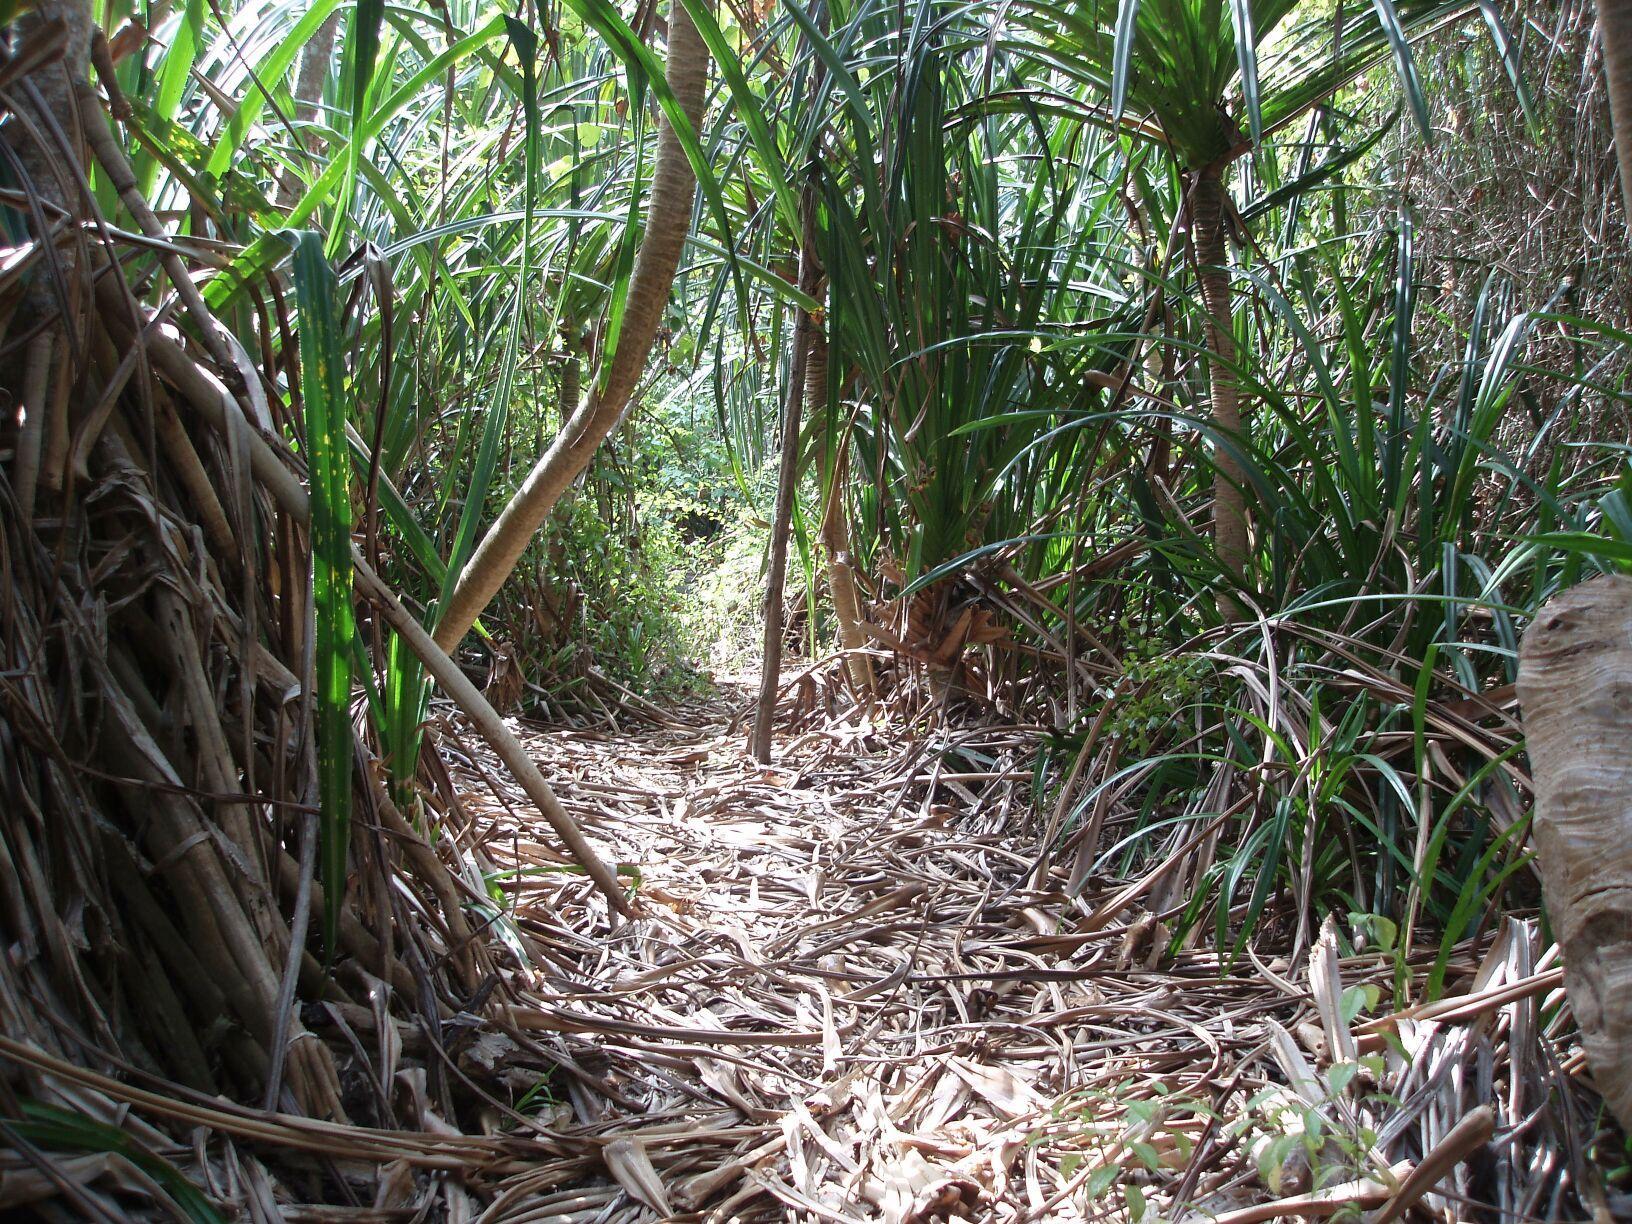 Nice Xmas_jungle_trail (JPEG Image, 1632 × 1224 Pixels)